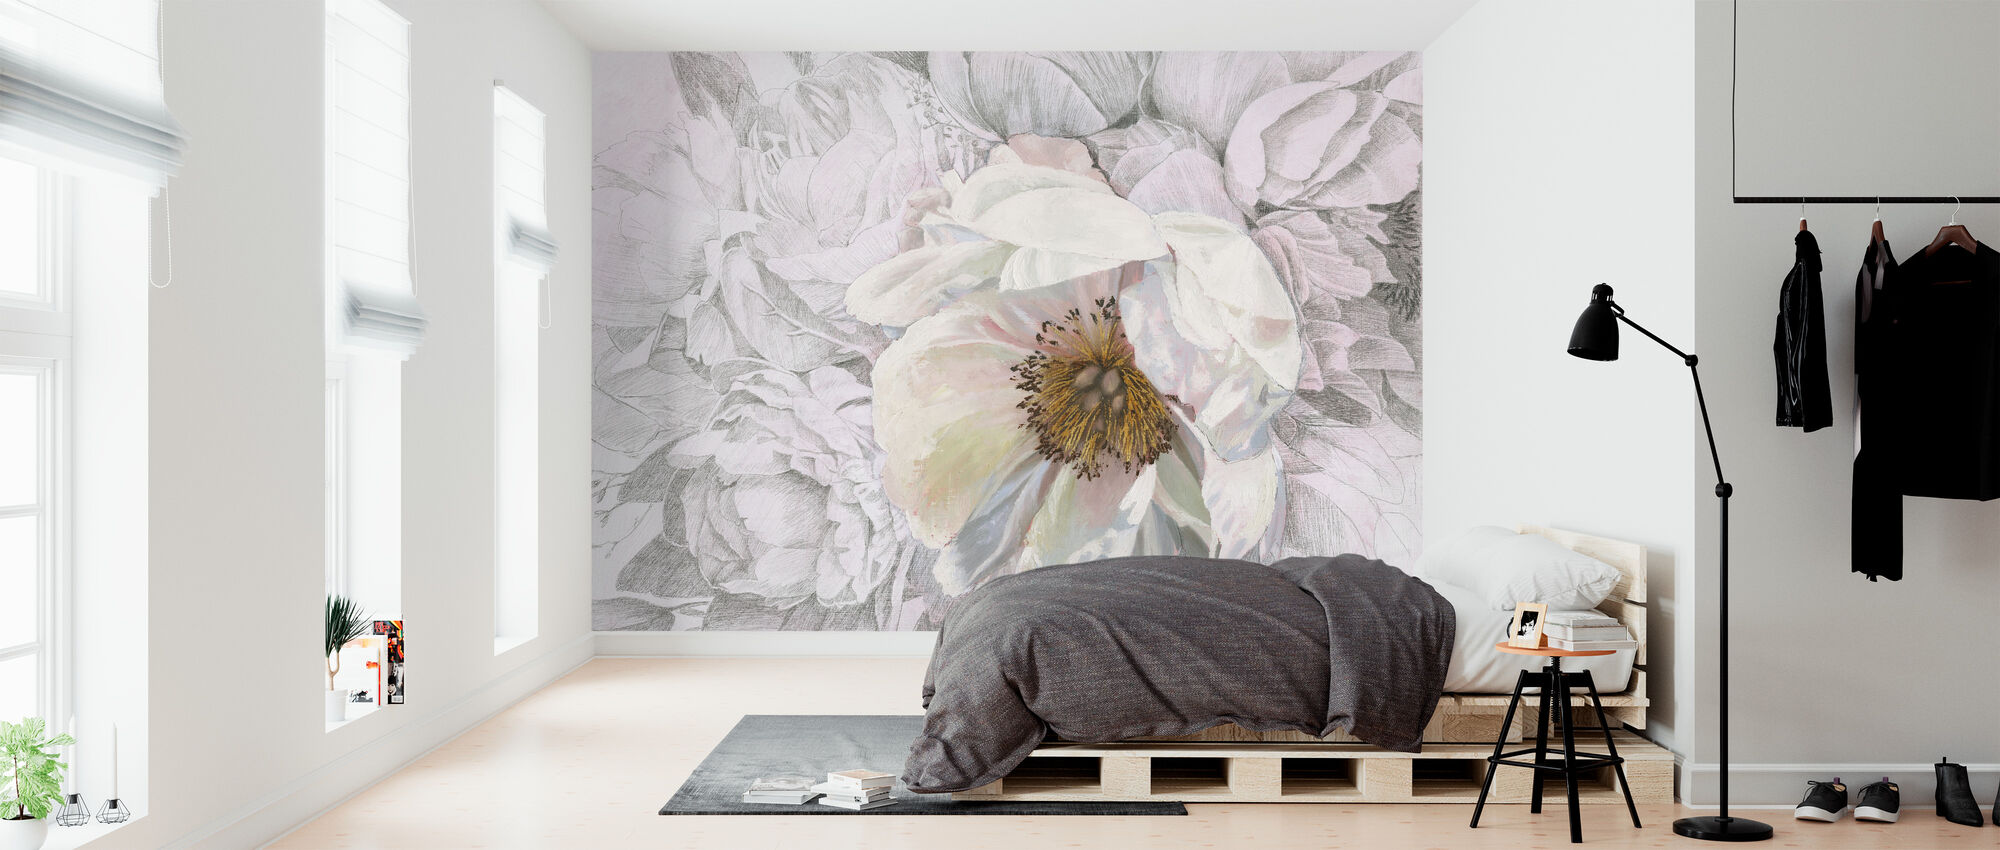 Blooming Sketch - Wallpaper - Bedroom